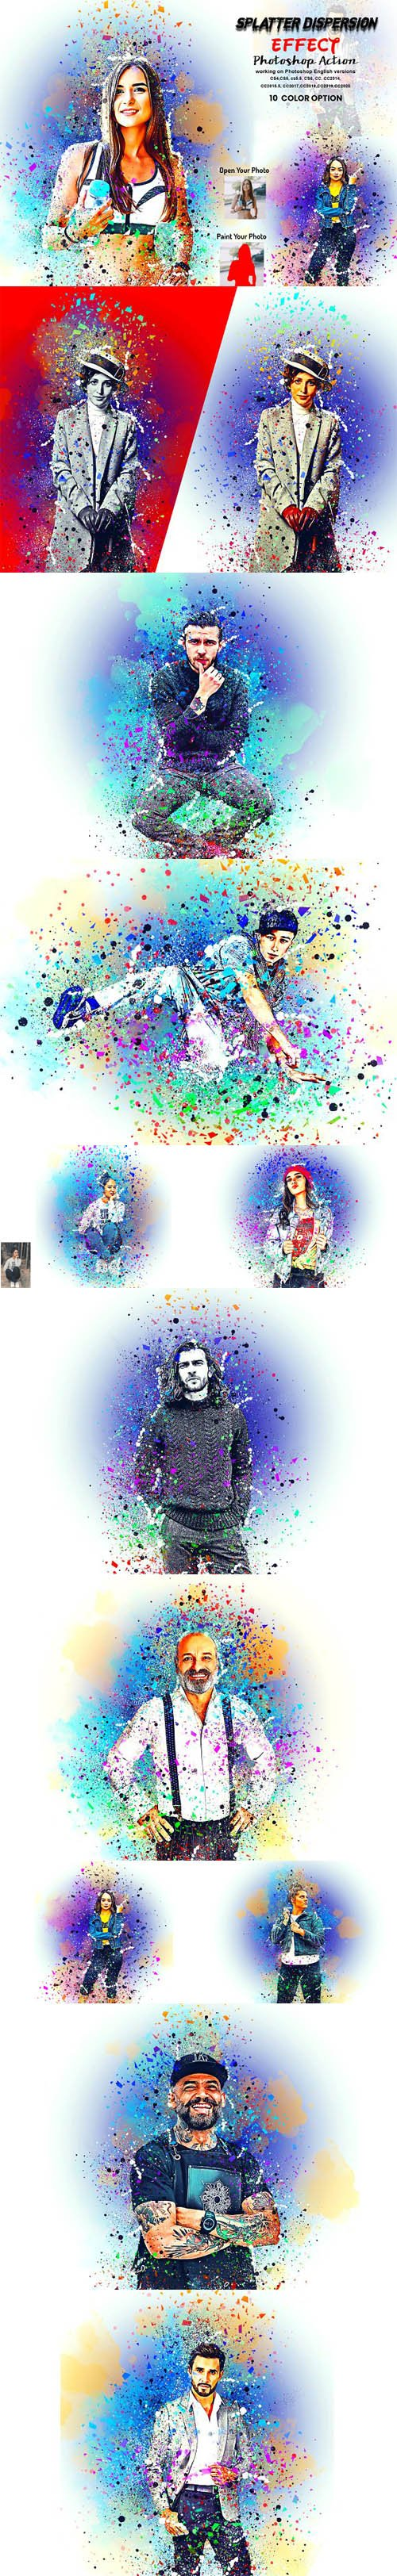 Splatter Dispersion Effect Action for Photoshop + Brushes